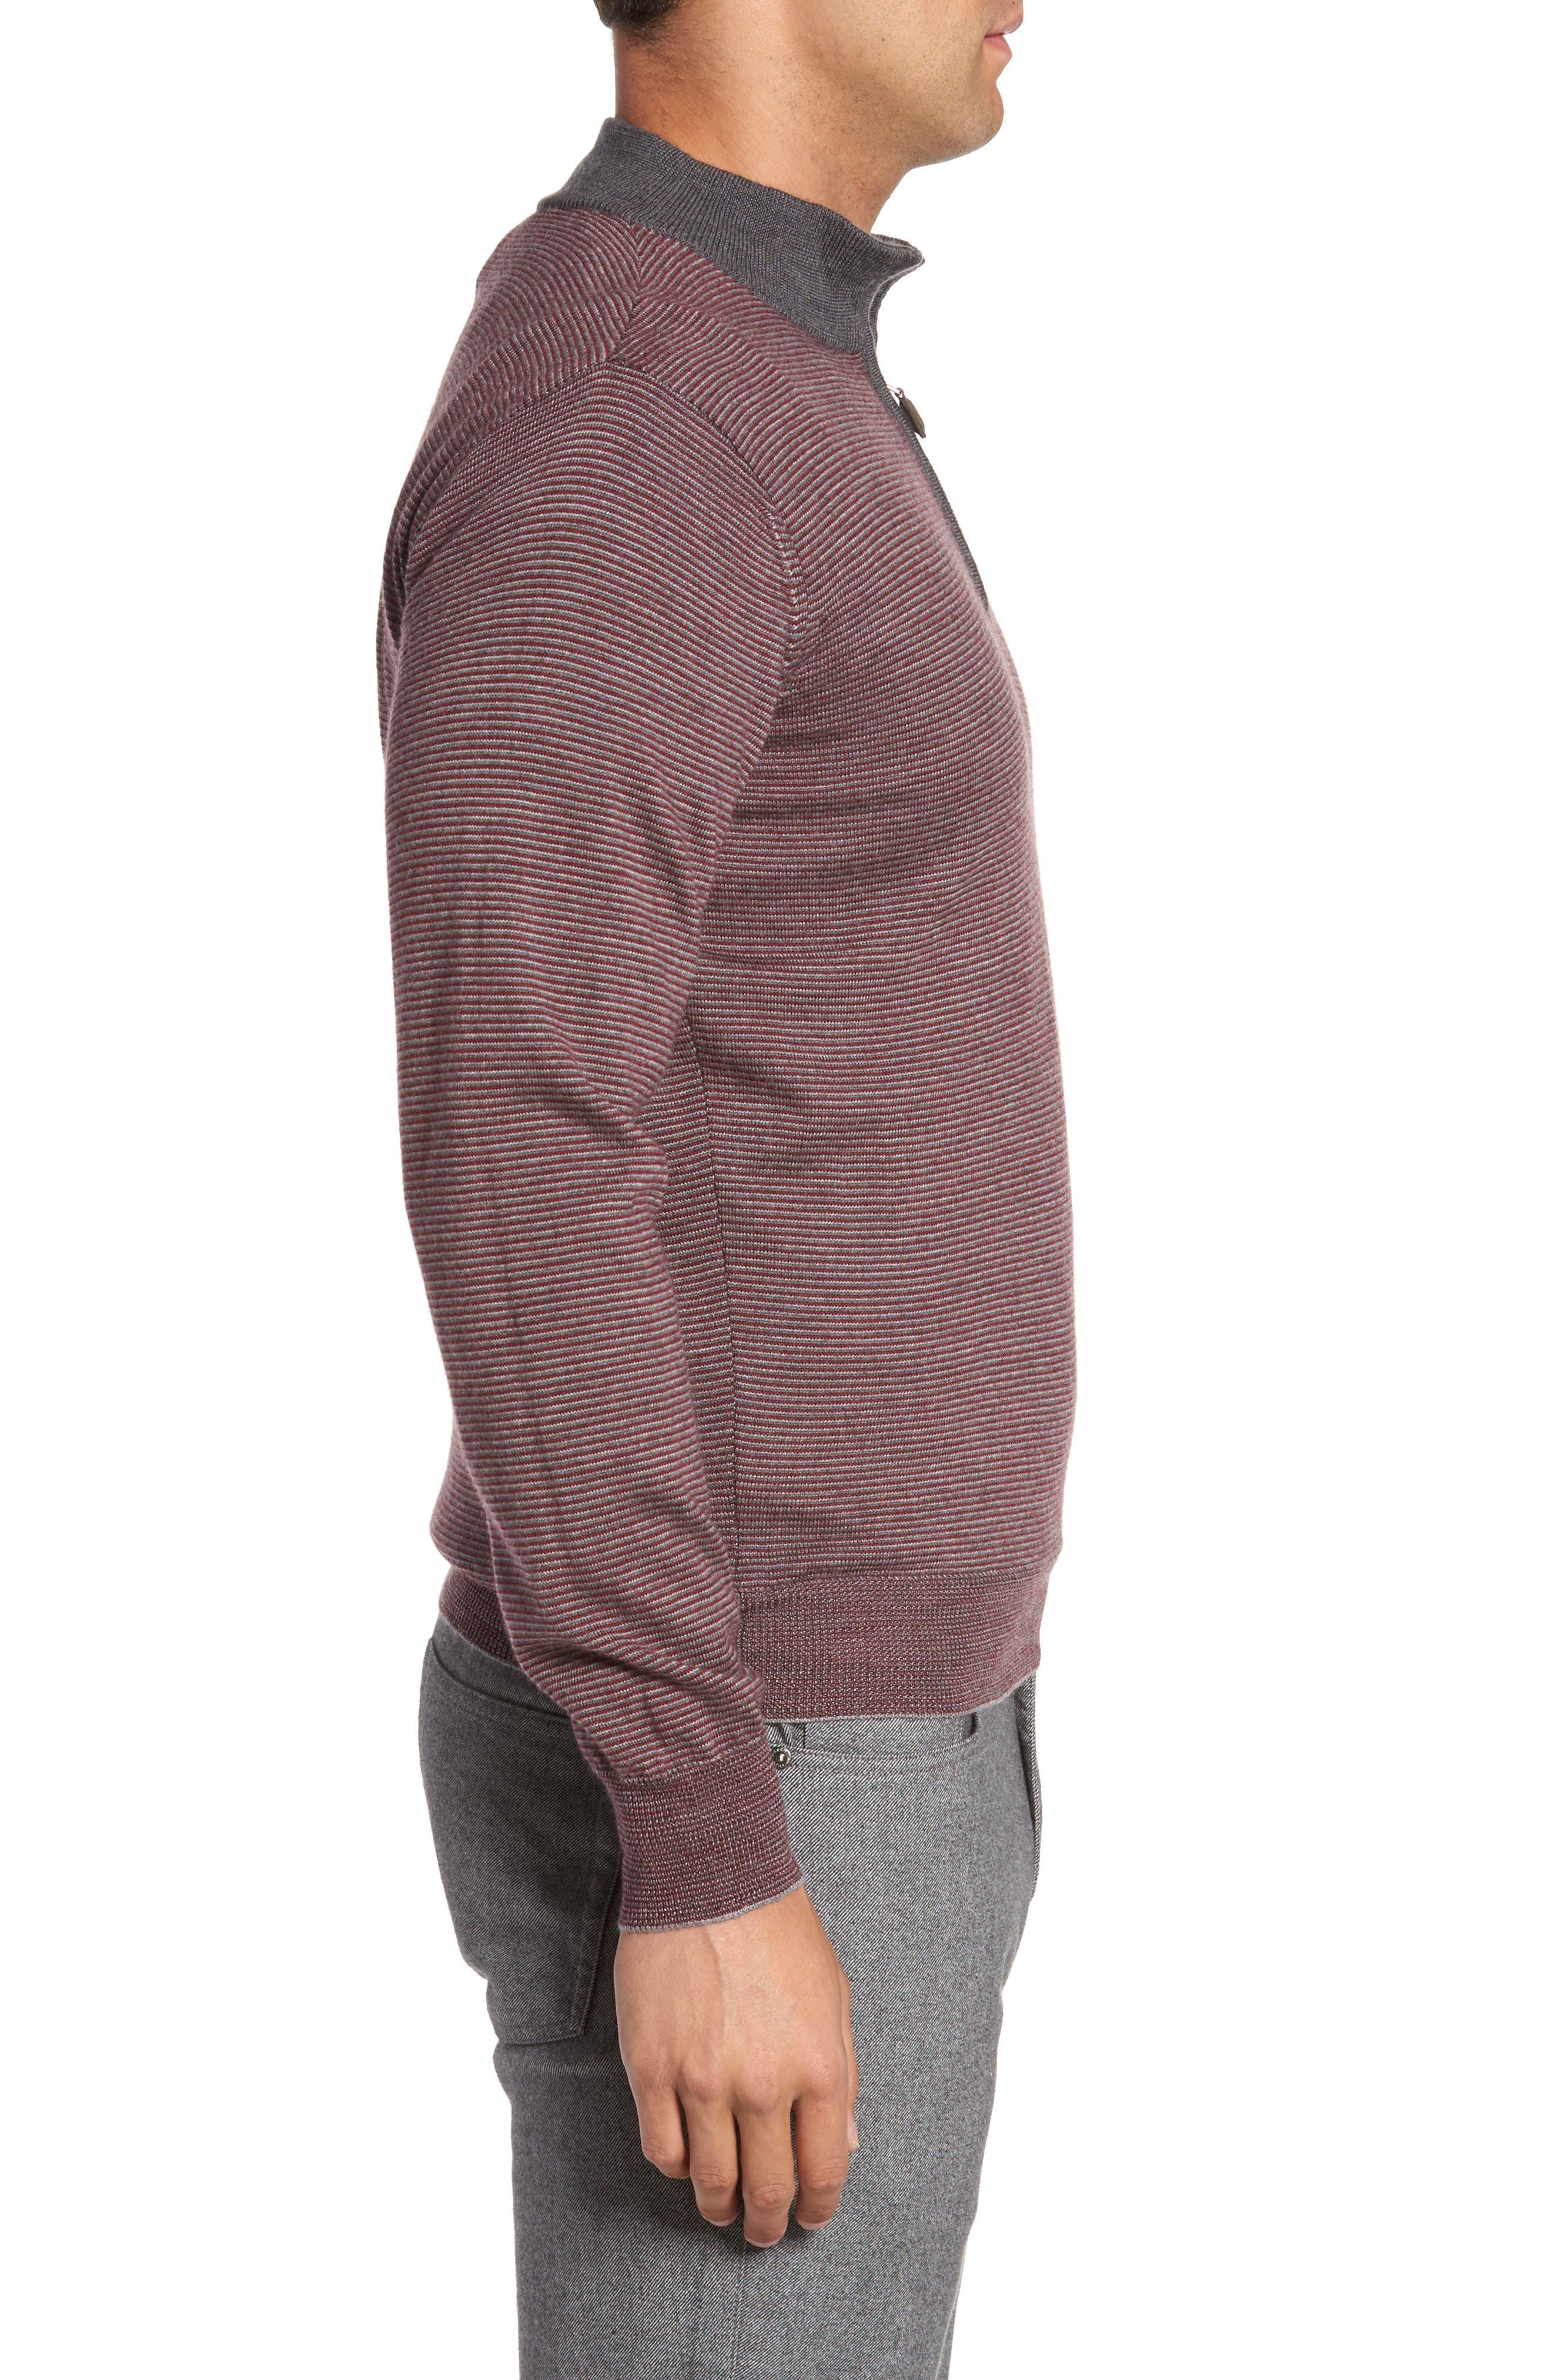 Trichrome Stripe Merino Wool Blend Sweater,                             Alternate thumbnail 3, color,                             930